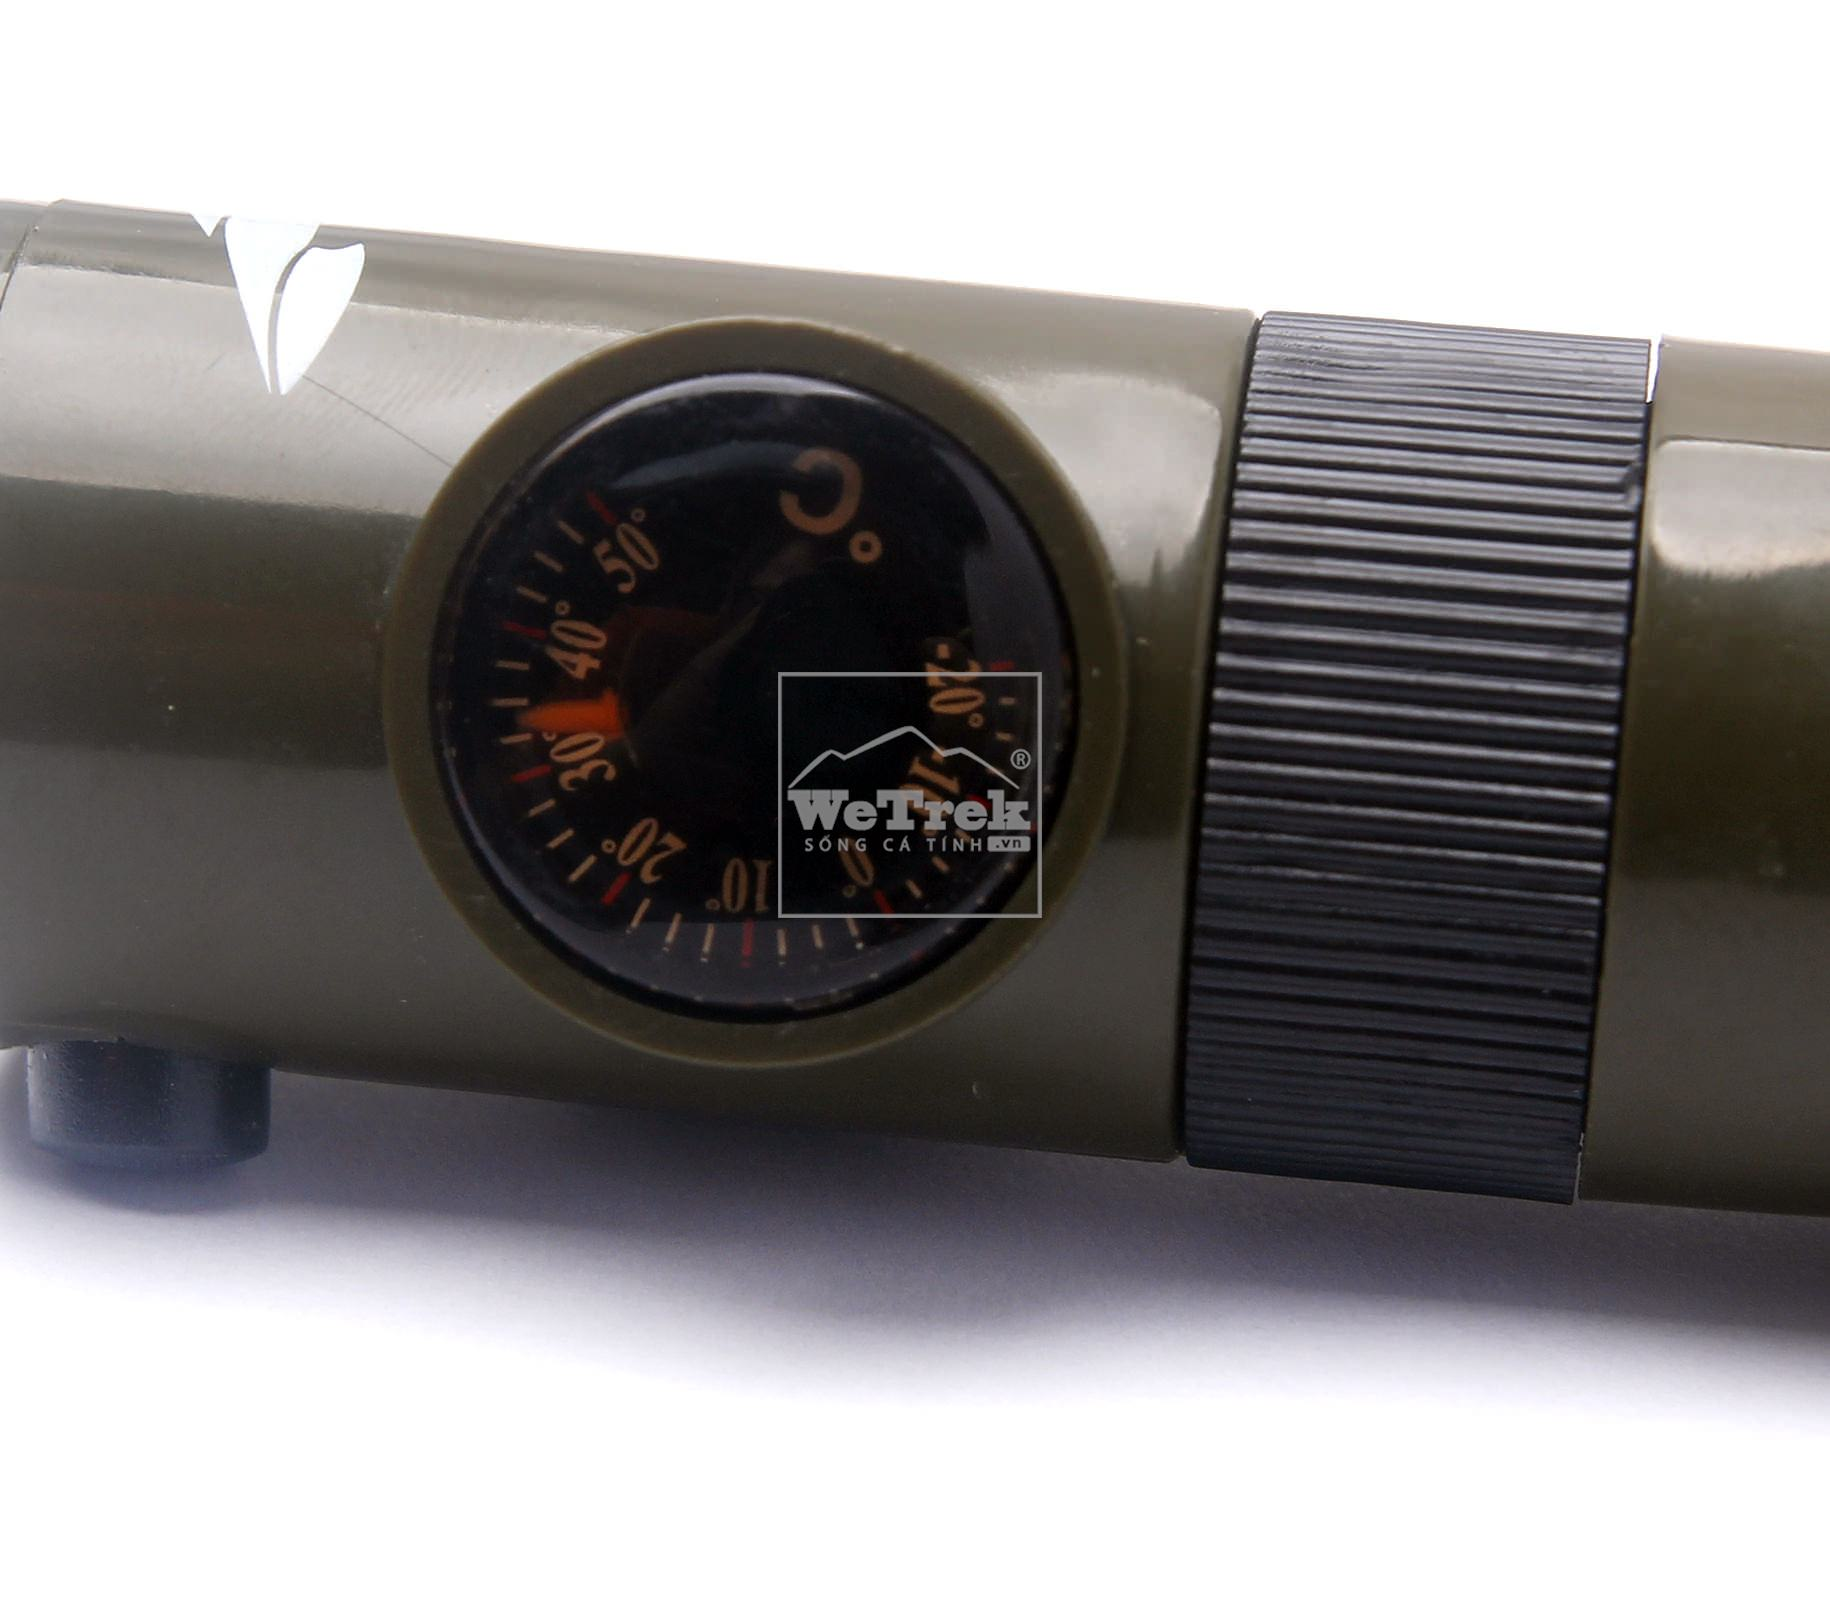 coi-cuu-ho-7-chuc-nang-ryder-emergency-whistle-l0005-6729-wetrek.vn-2